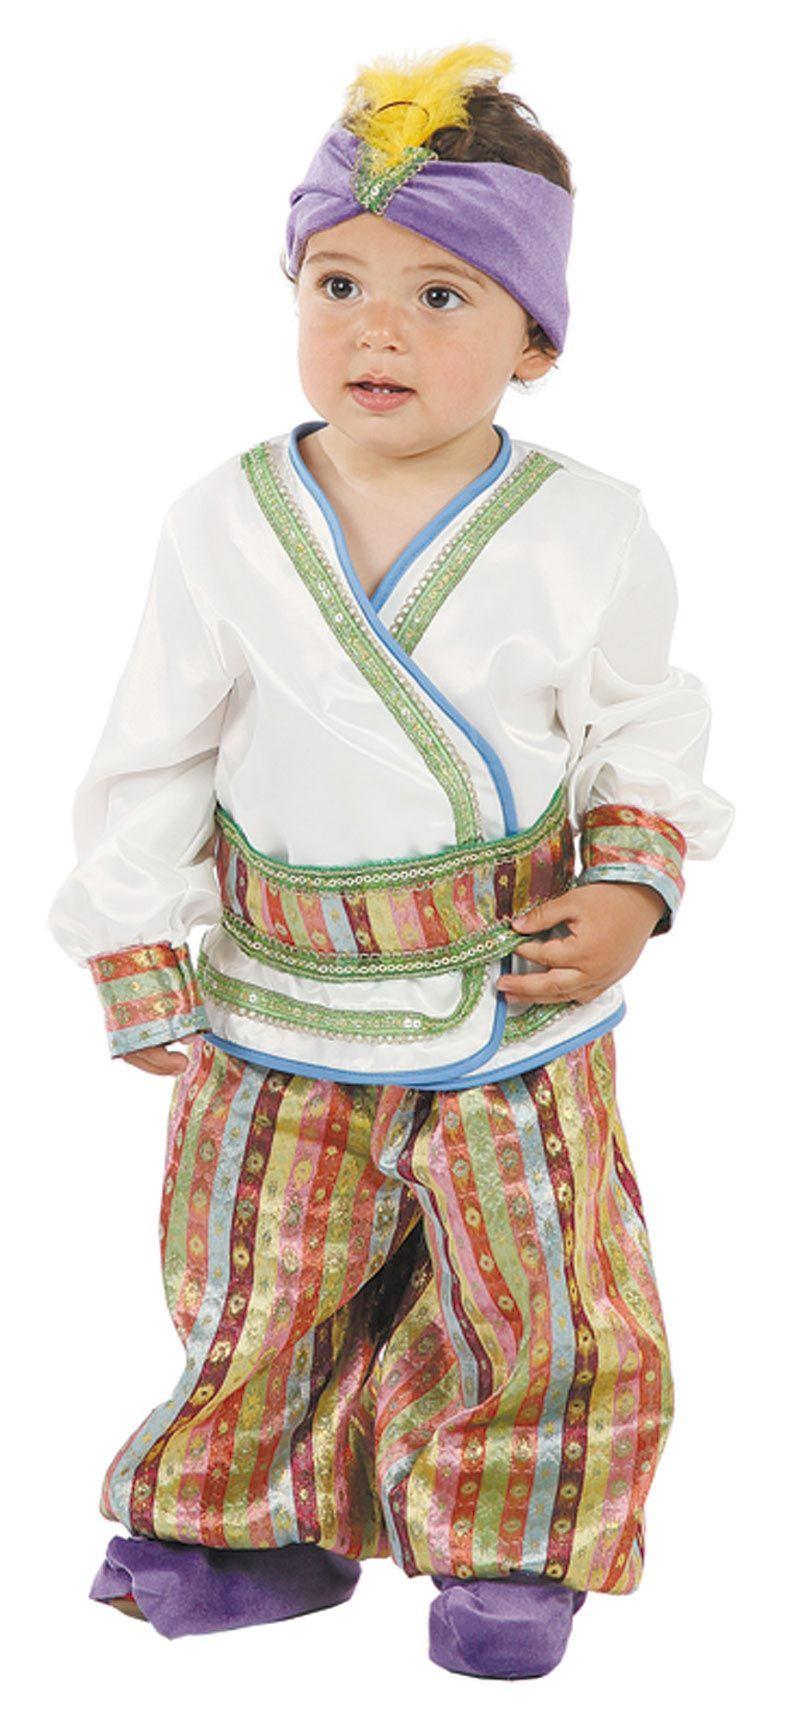 Disfraz de príncipe árabe